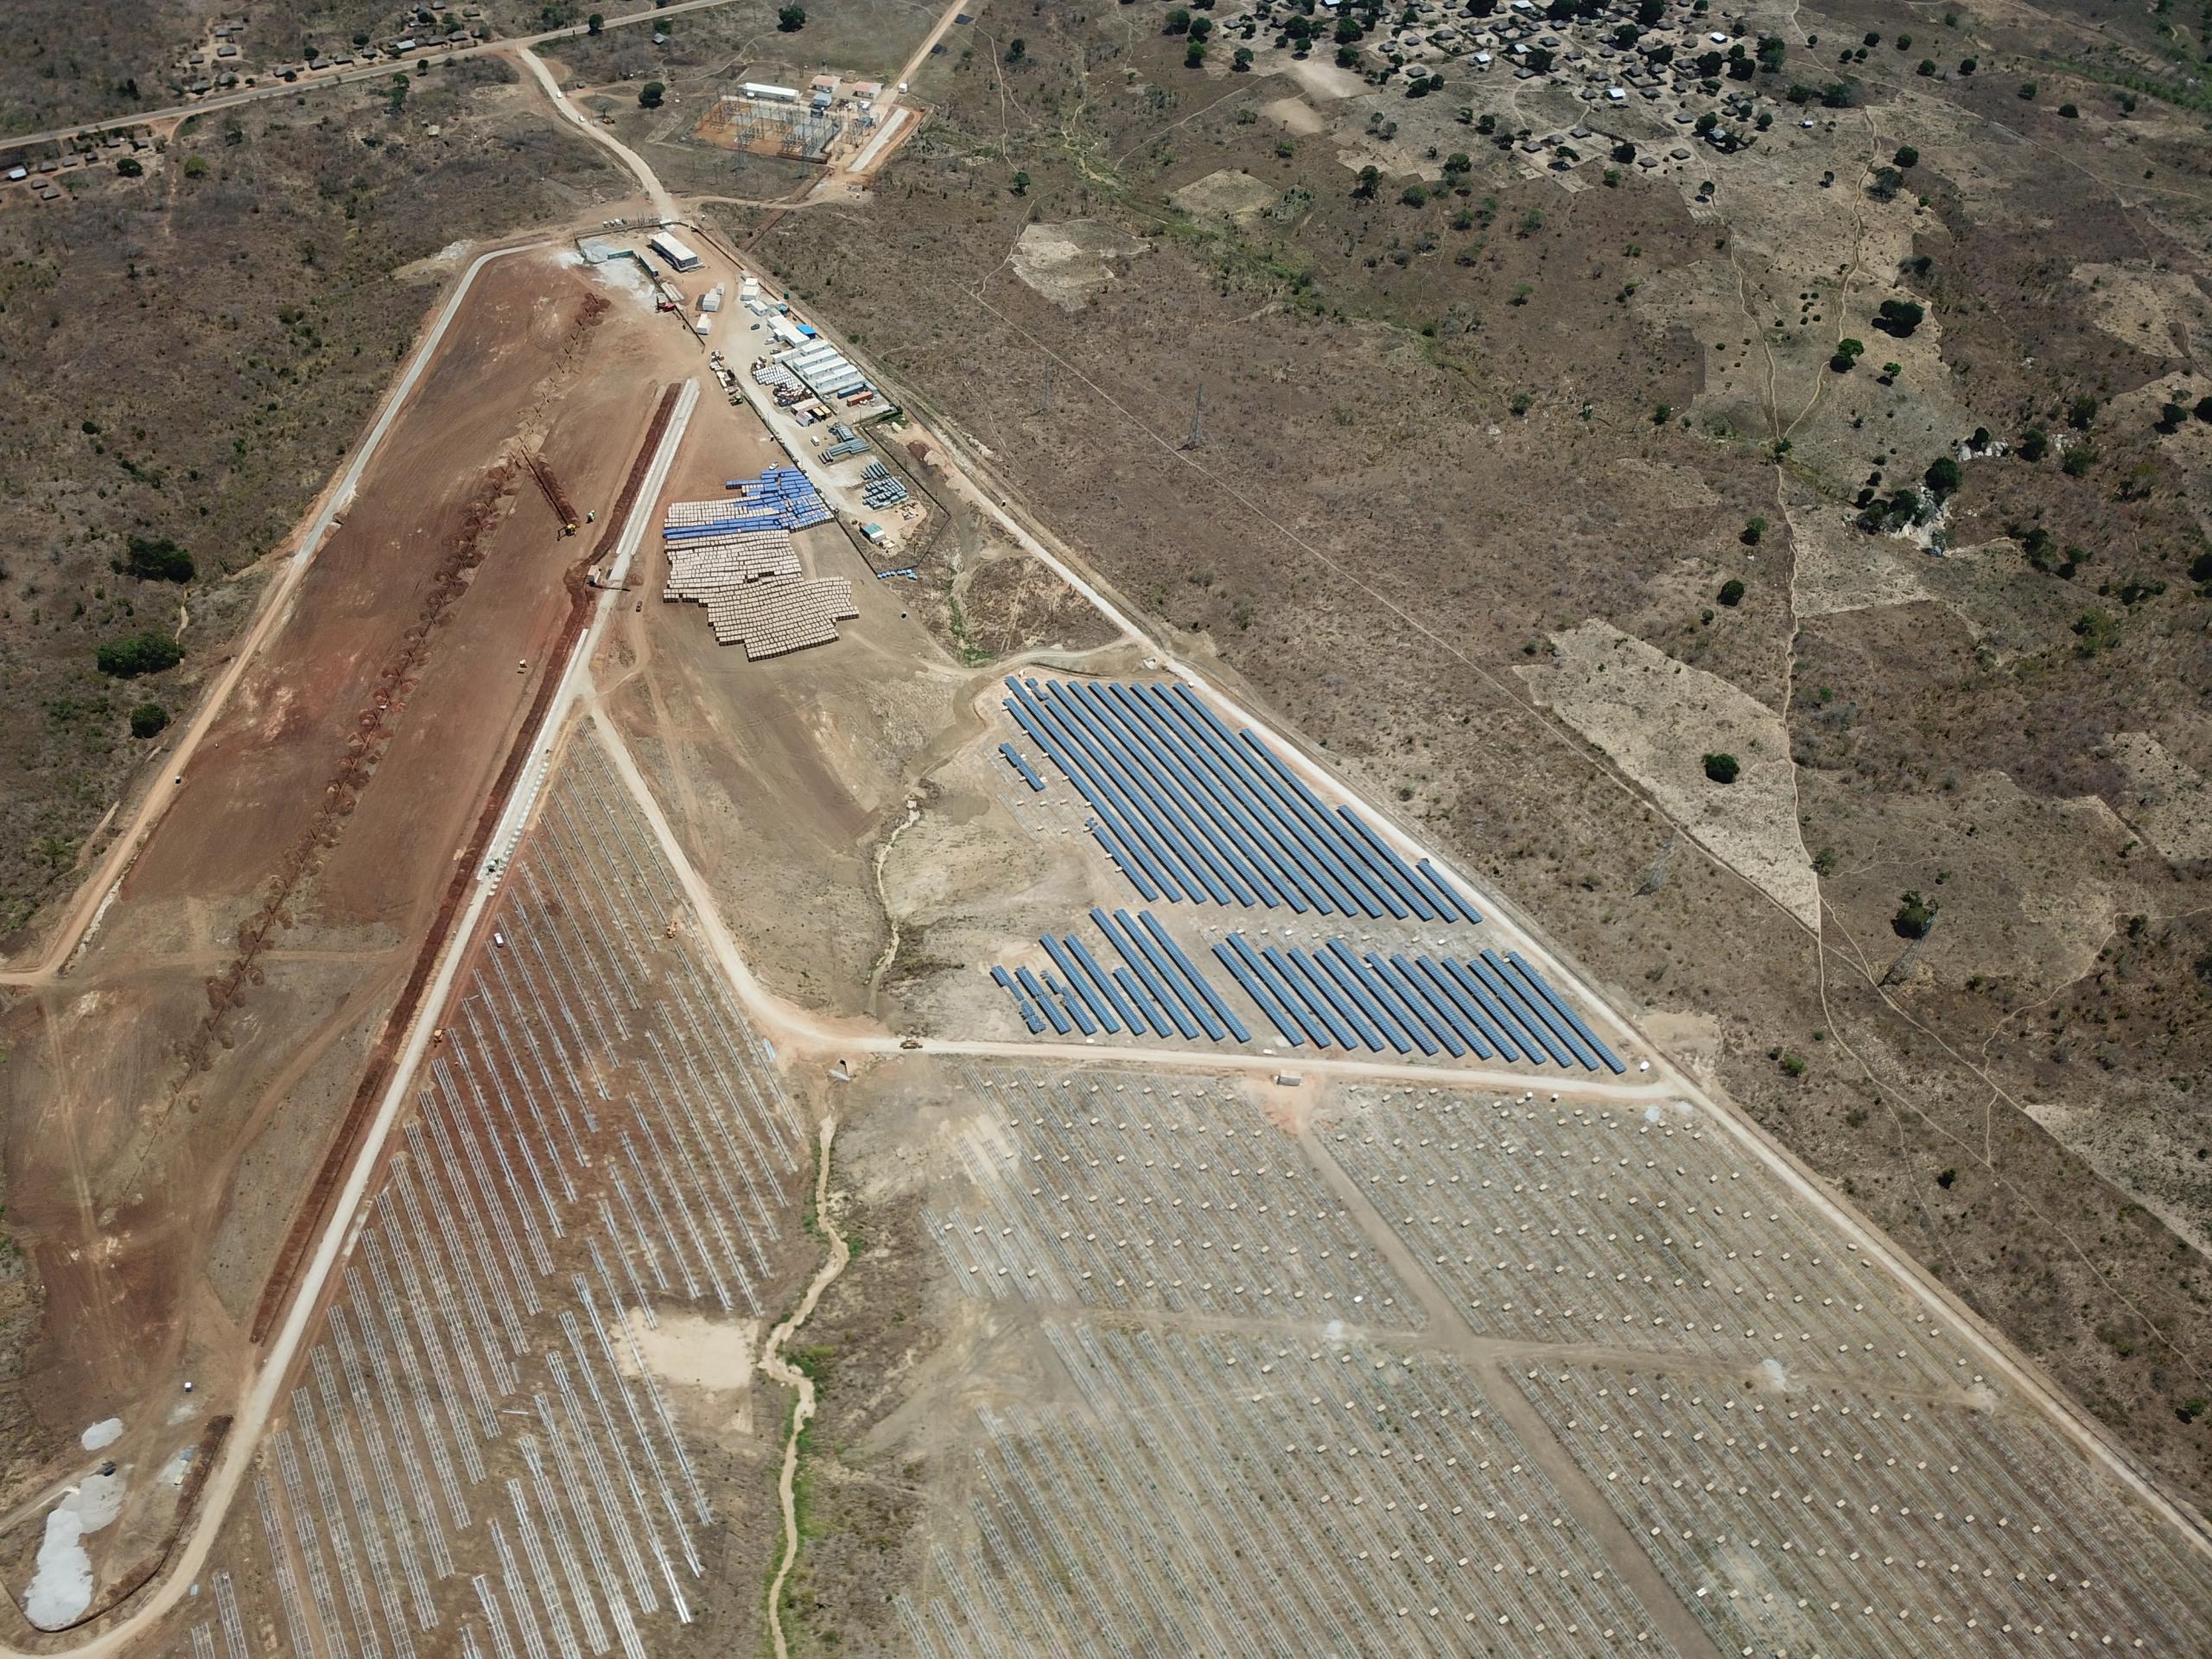 Ministro da Energia de Moçambique visitou o Parque Fotovoltaico de Metoro